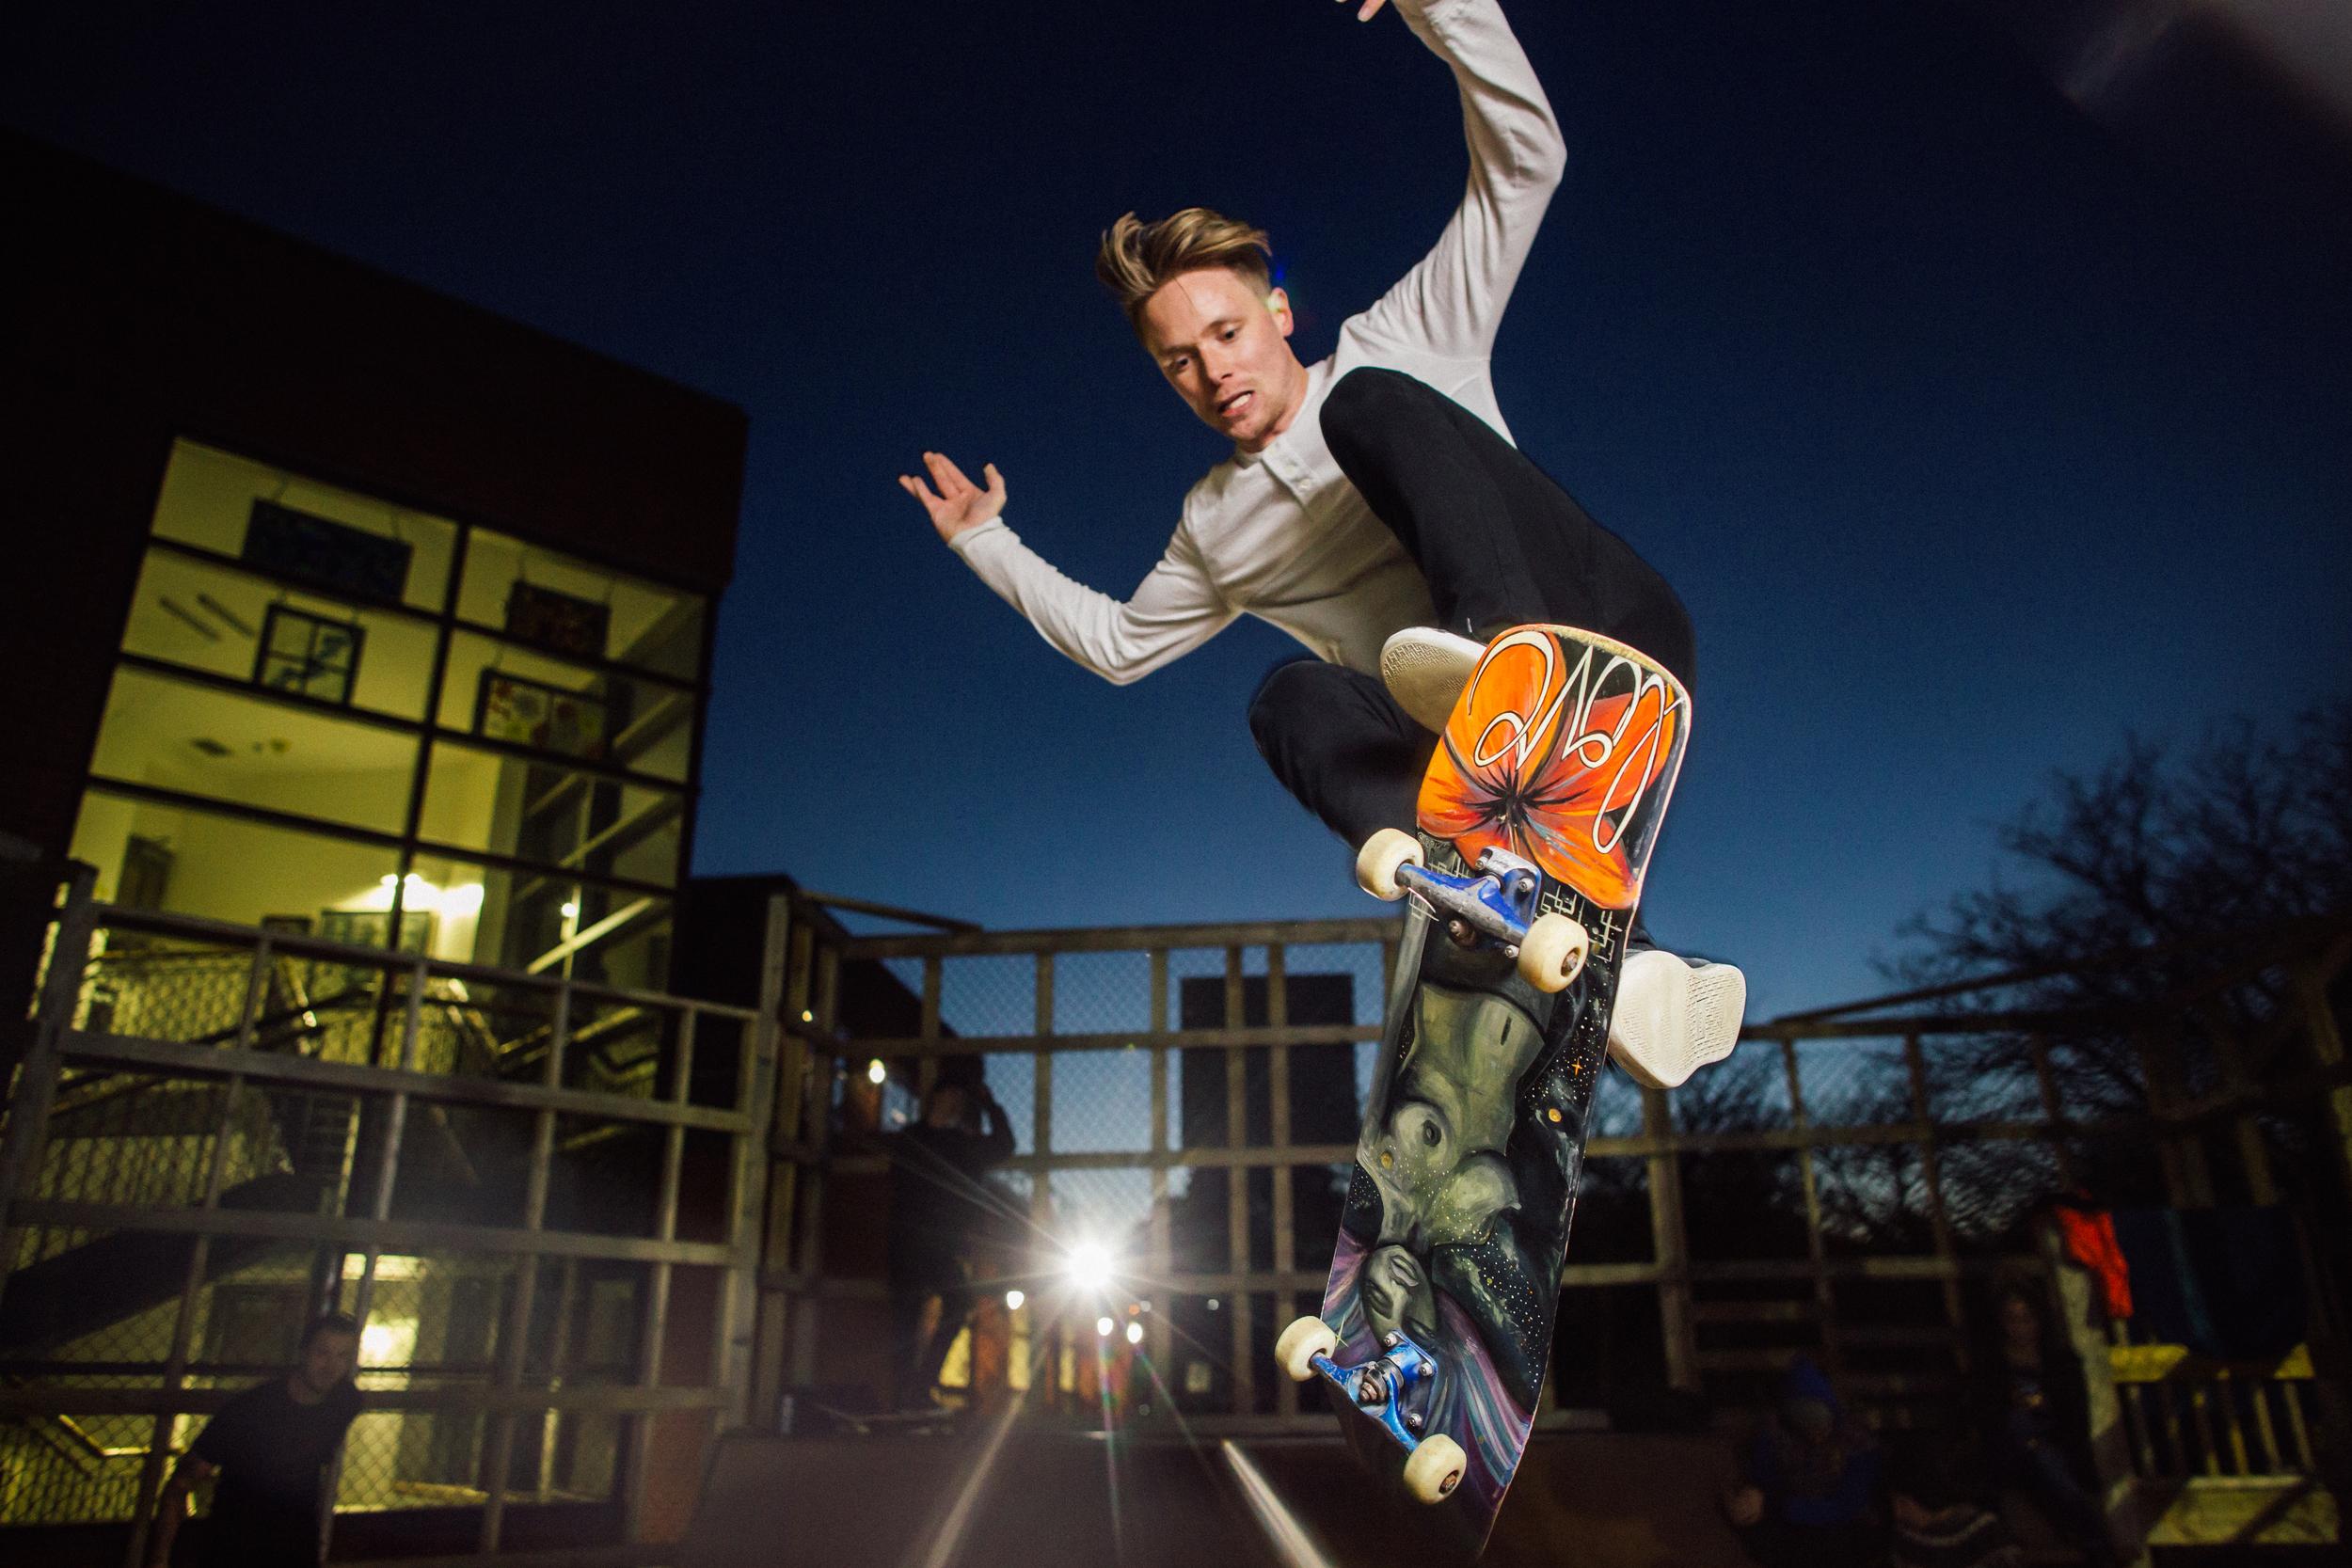 151023-183756-SkylerSkateboarding_DavidJohnsonPhotography_Mailyne Briggs_Dream Love Grow Art-0214.jpg